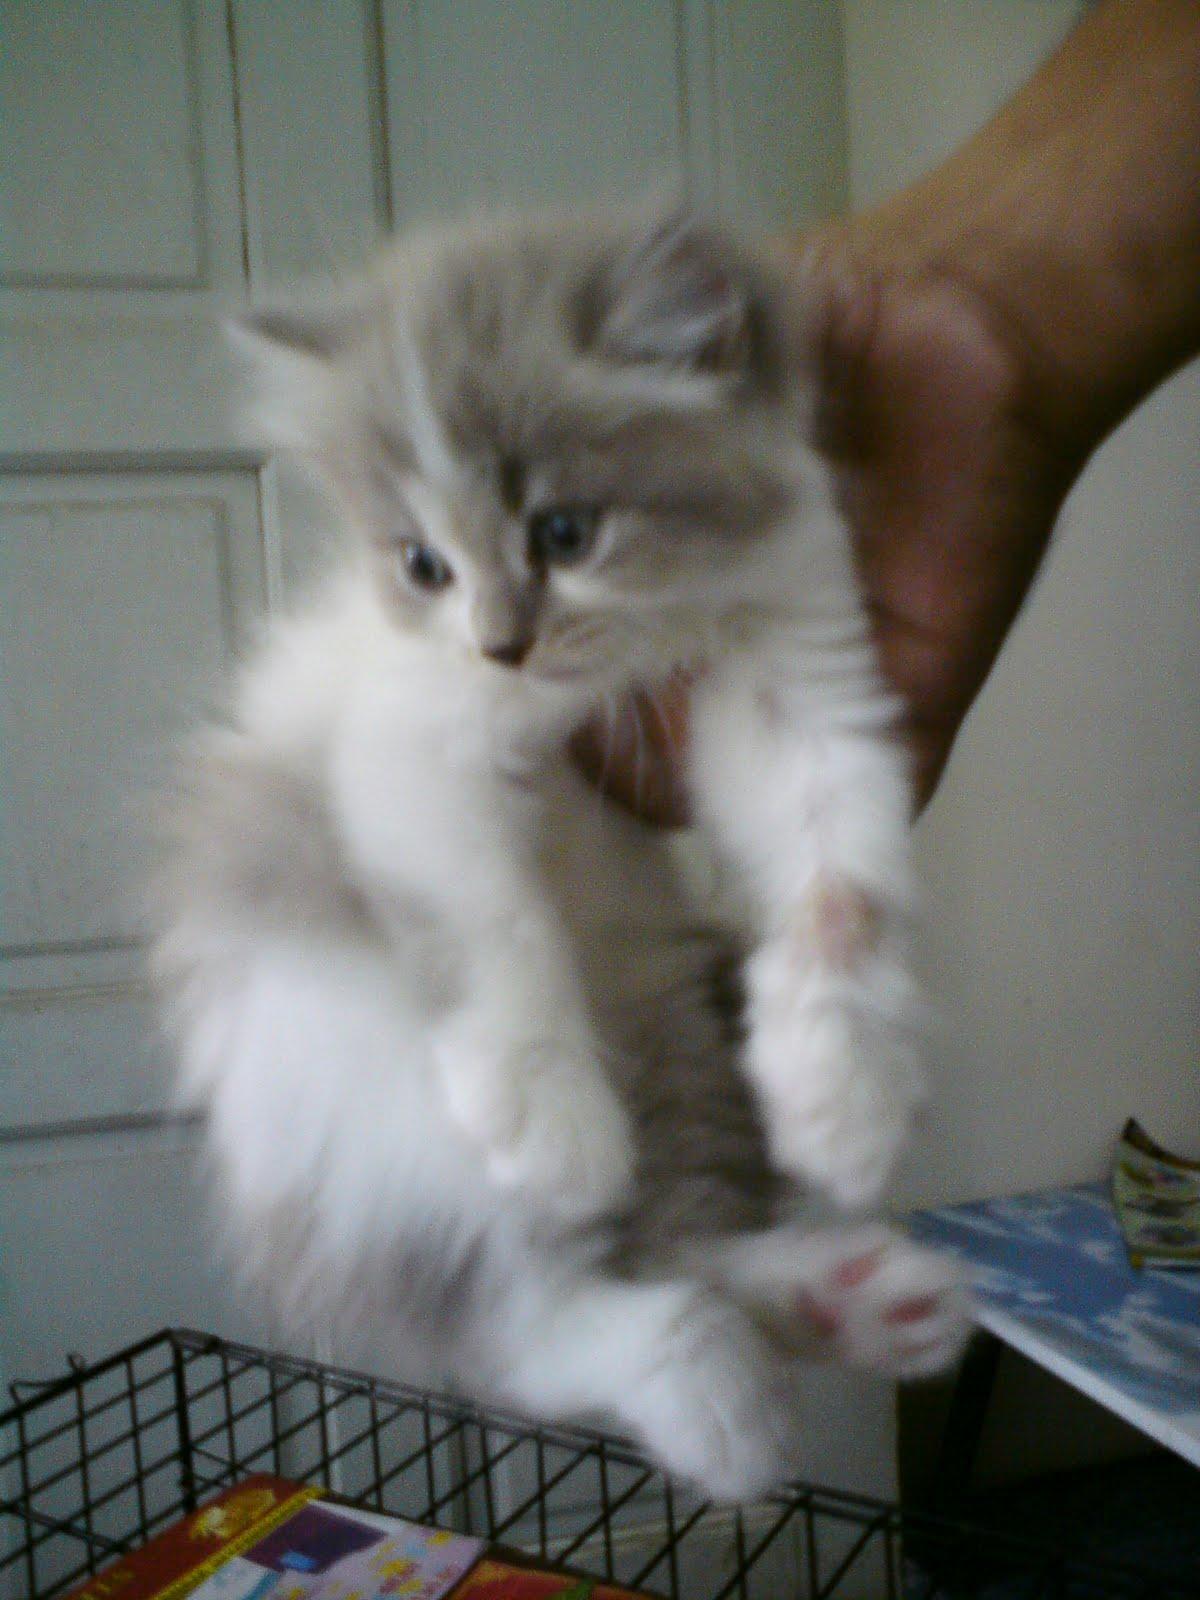 Harga Gambar Kucing Parsi Pahlawan Maokil Anak Kucing